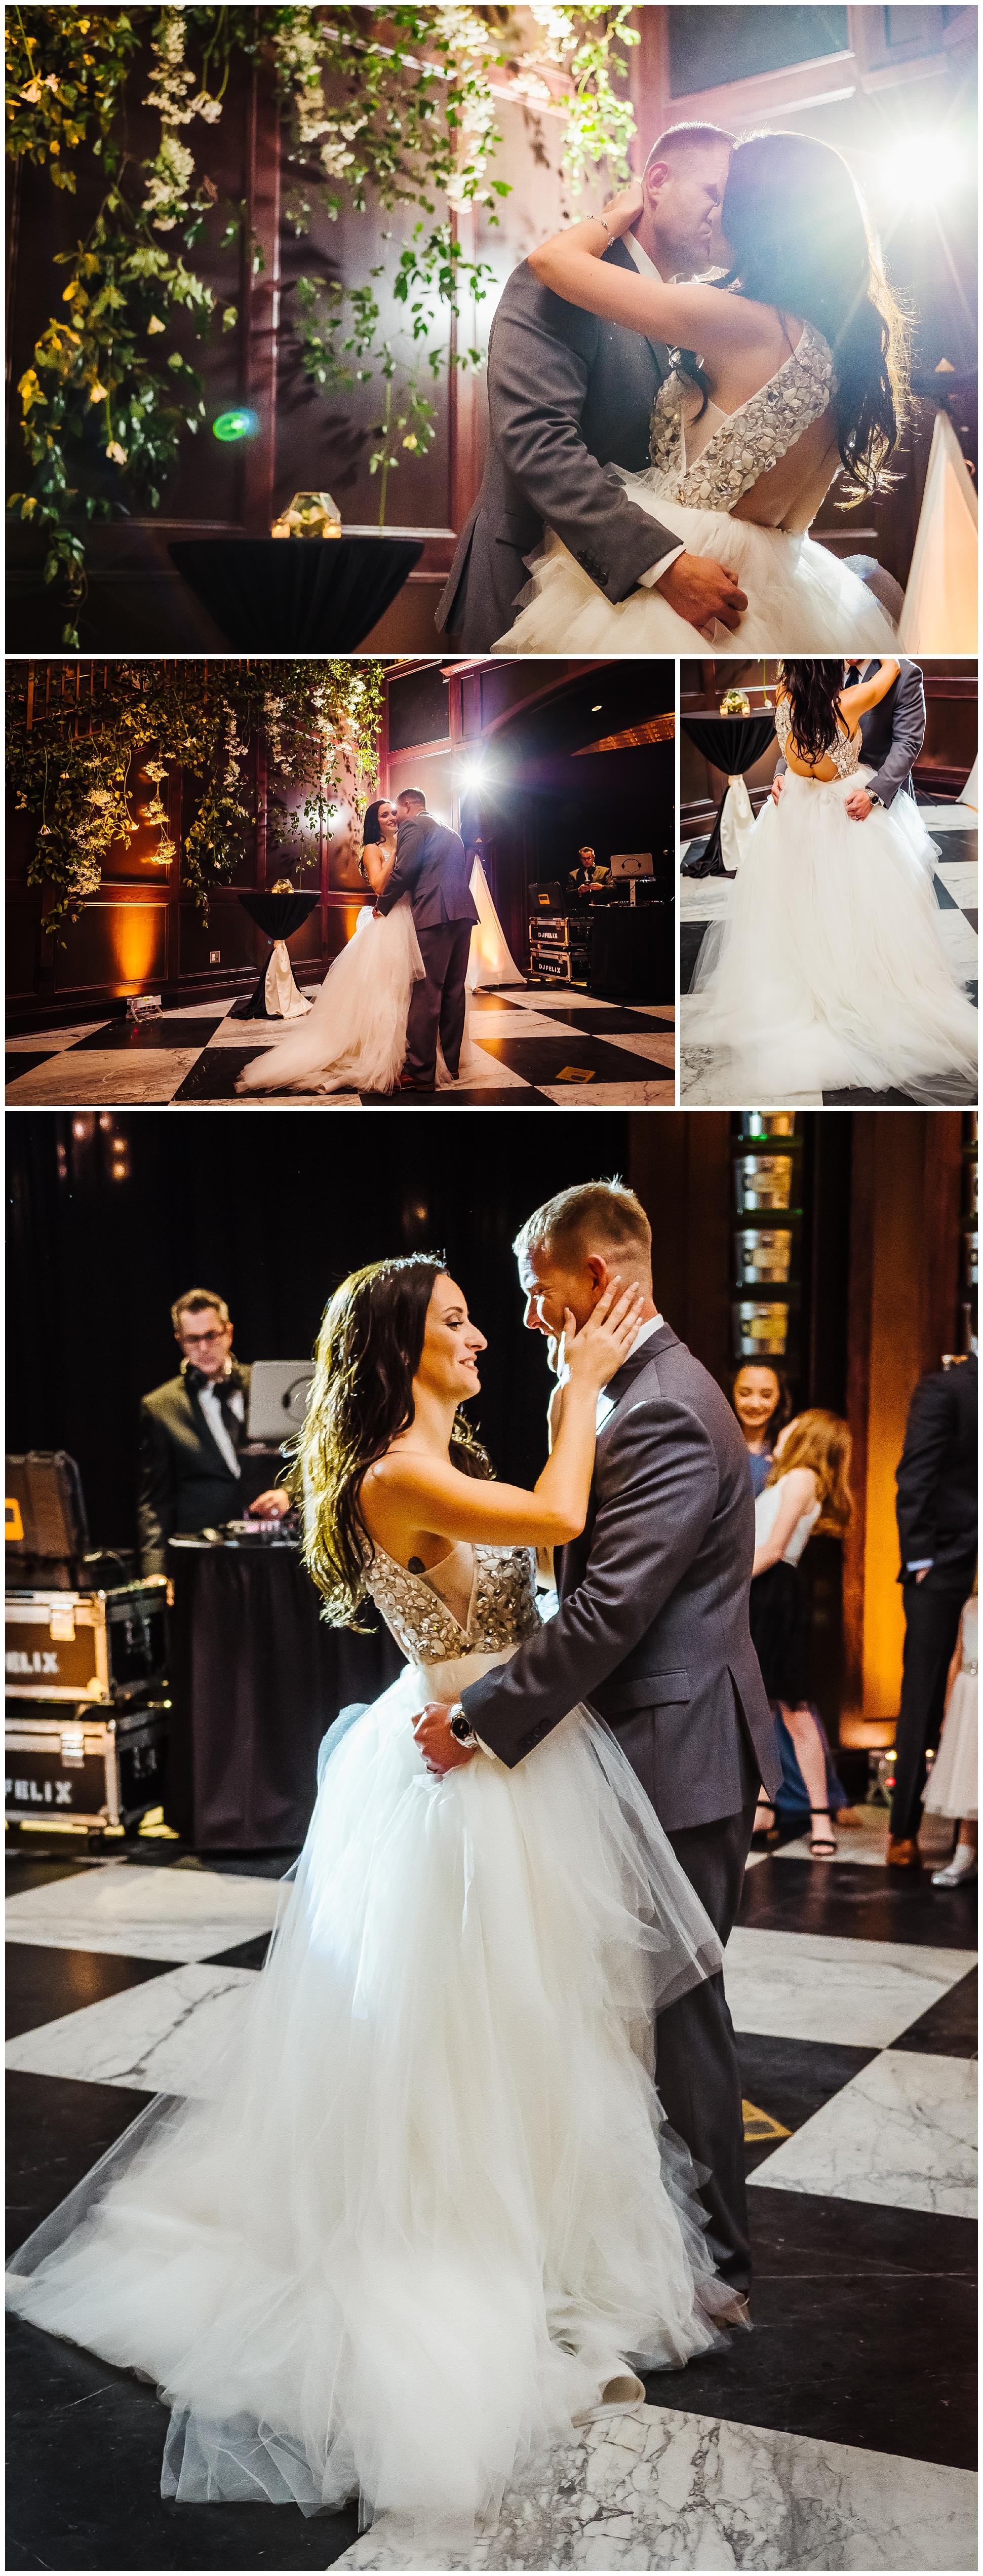 tampa-wedding-photographer-oxford-exchange-garland-candlelight-gold-hayley-paige_0054.jpg